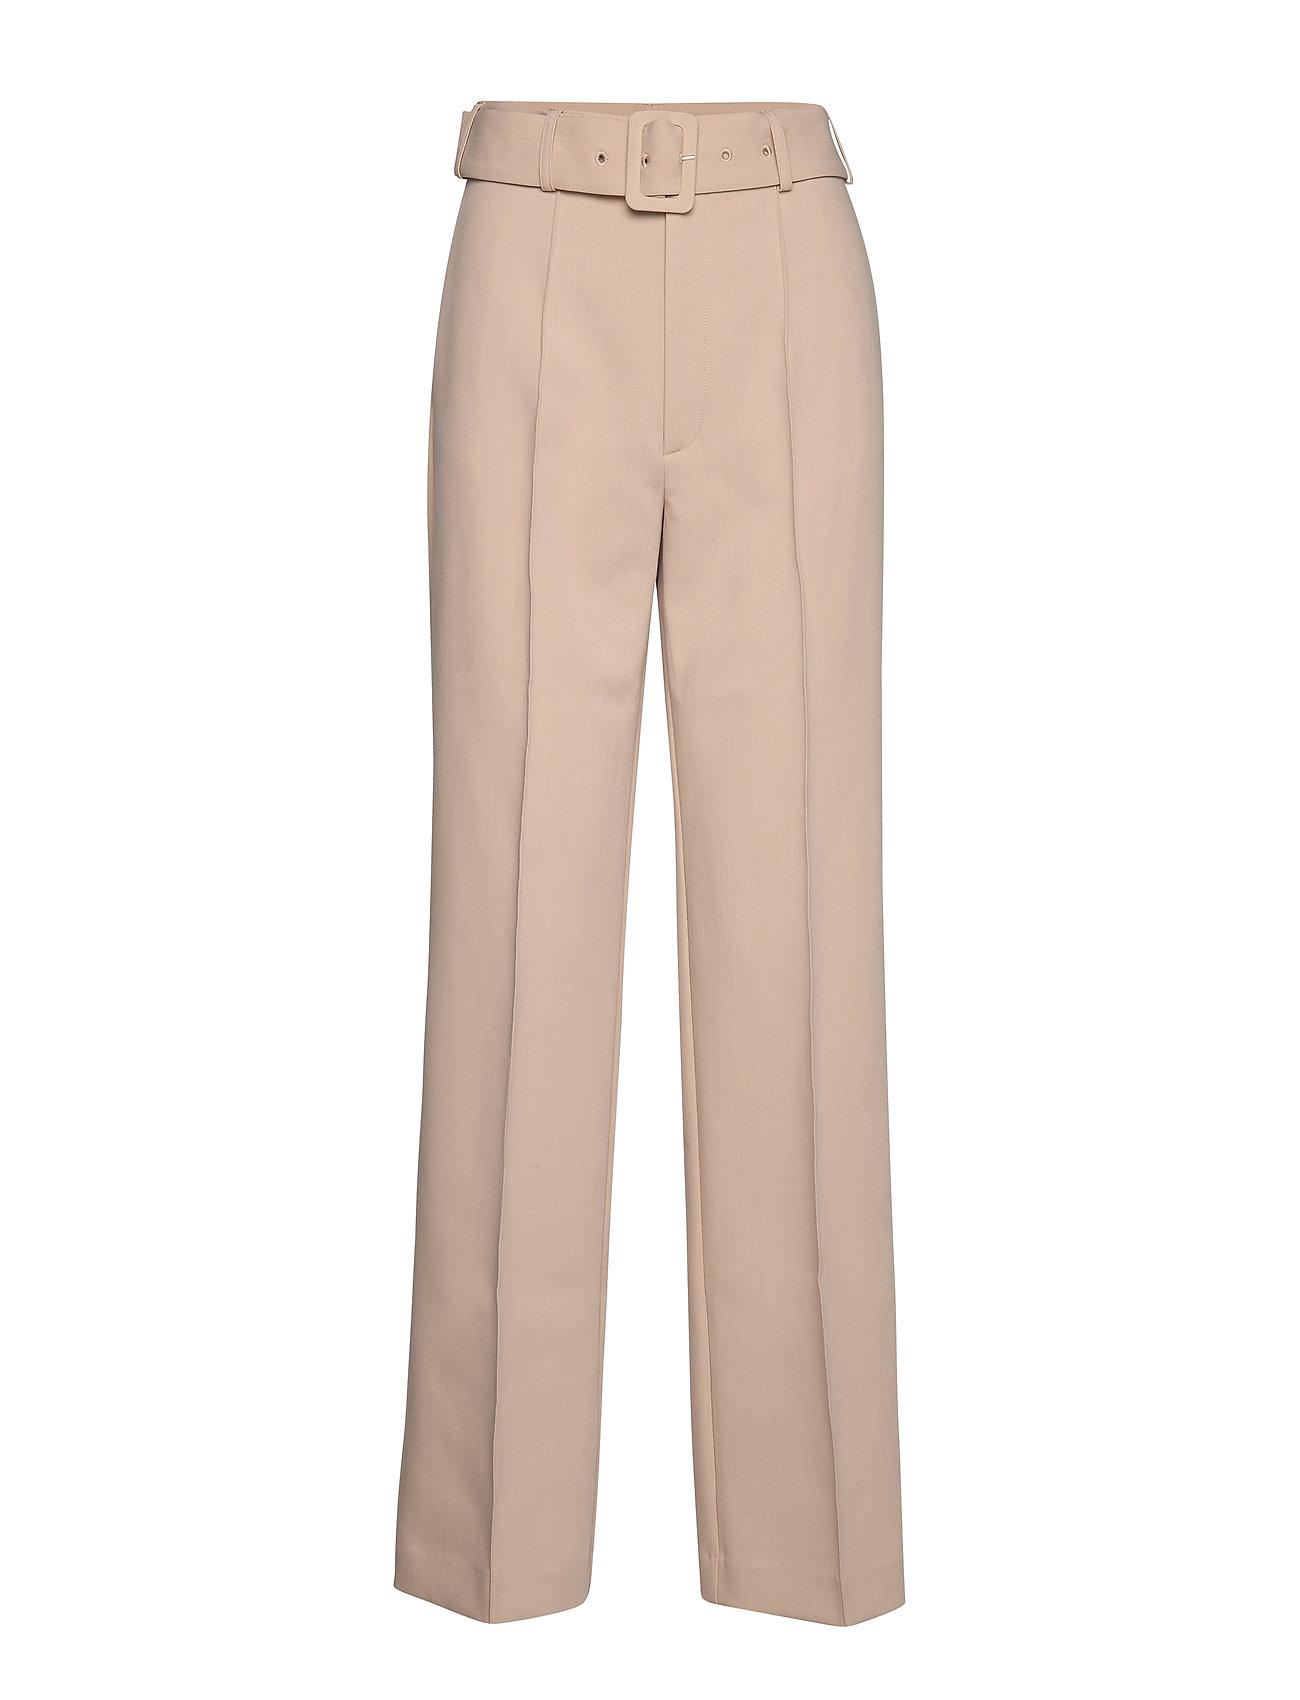 Ivyrevel Belted Suit Pants (Beige), 503.40